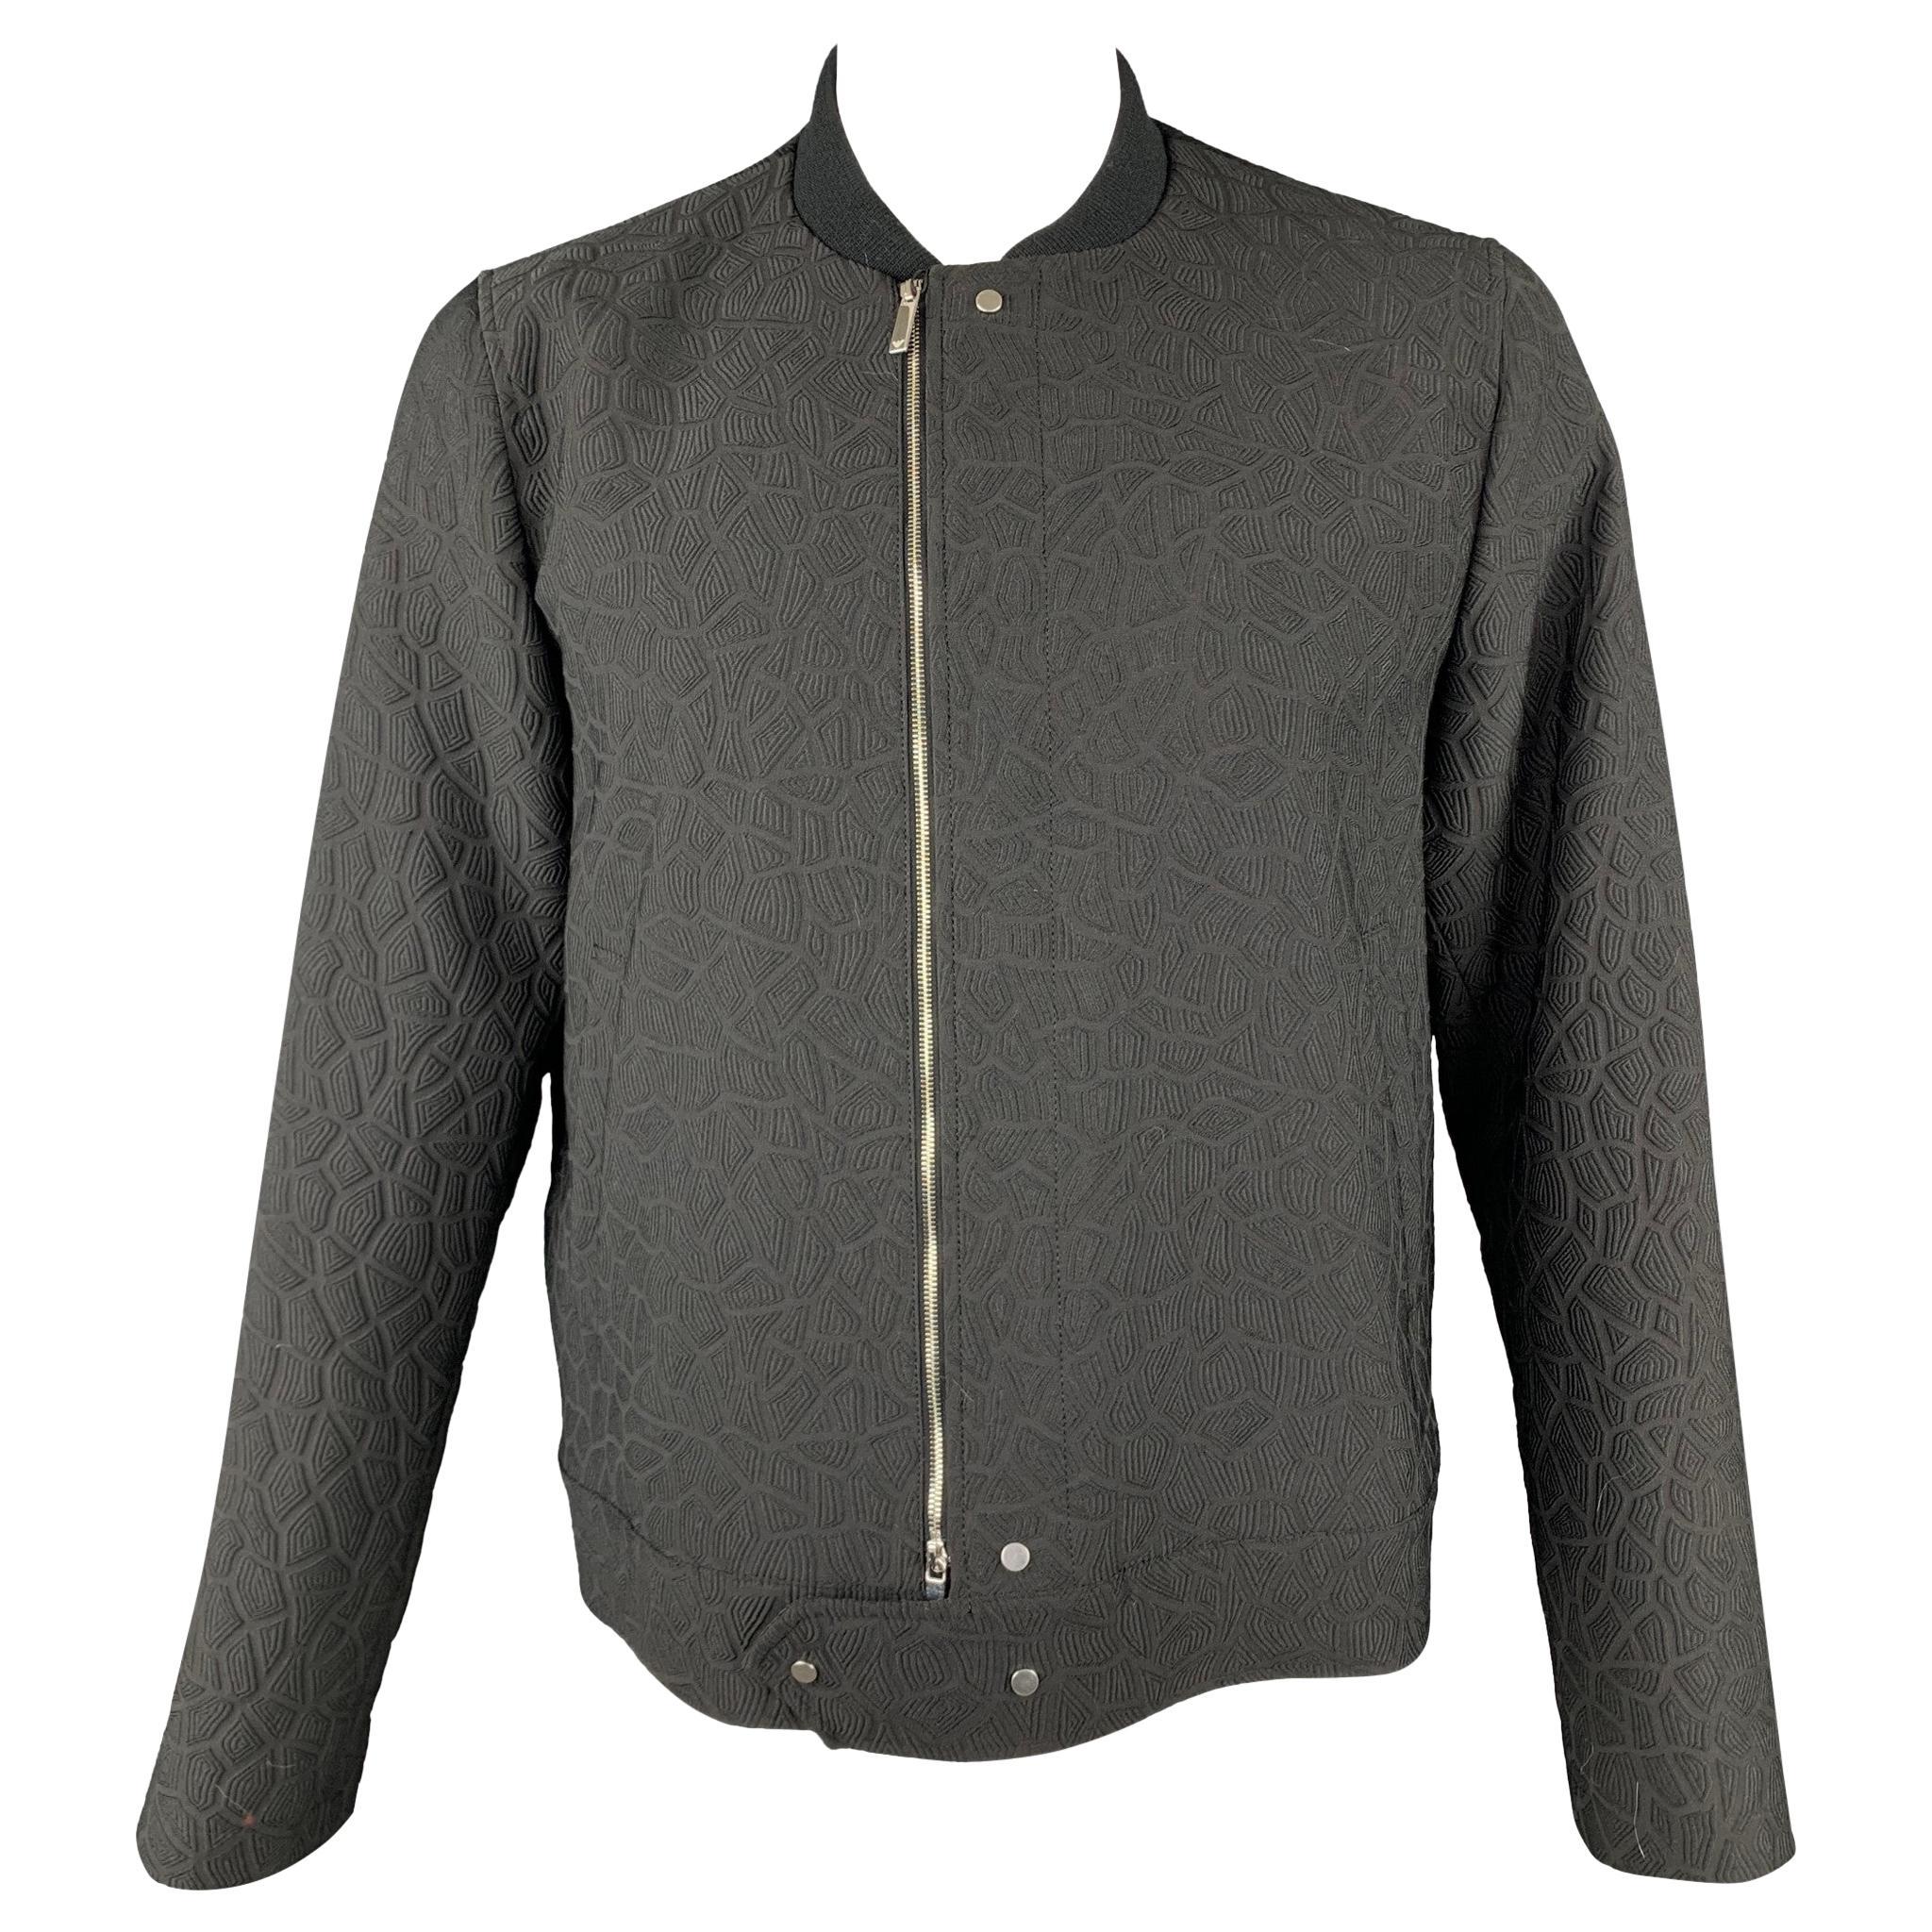 EMPORIO ARMANI Size 46 Black Textured Polyester Zip Up Jacket